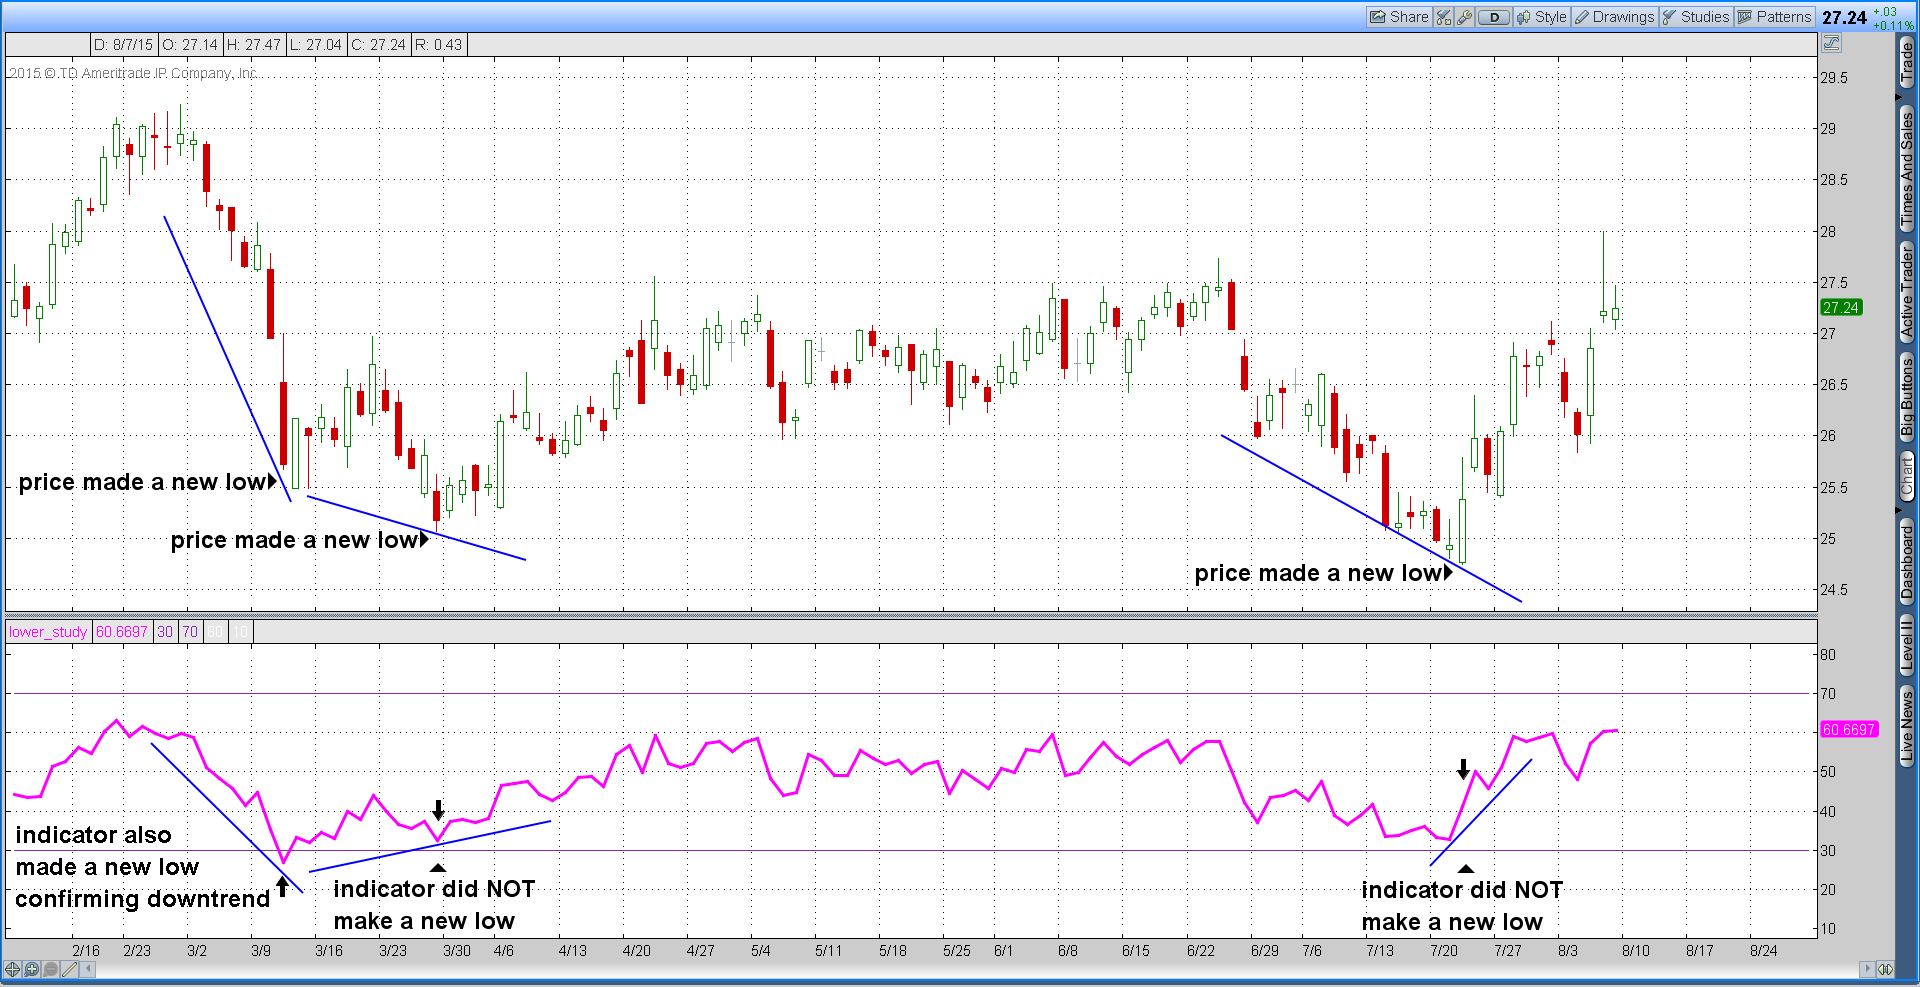 Bullish chart divergence